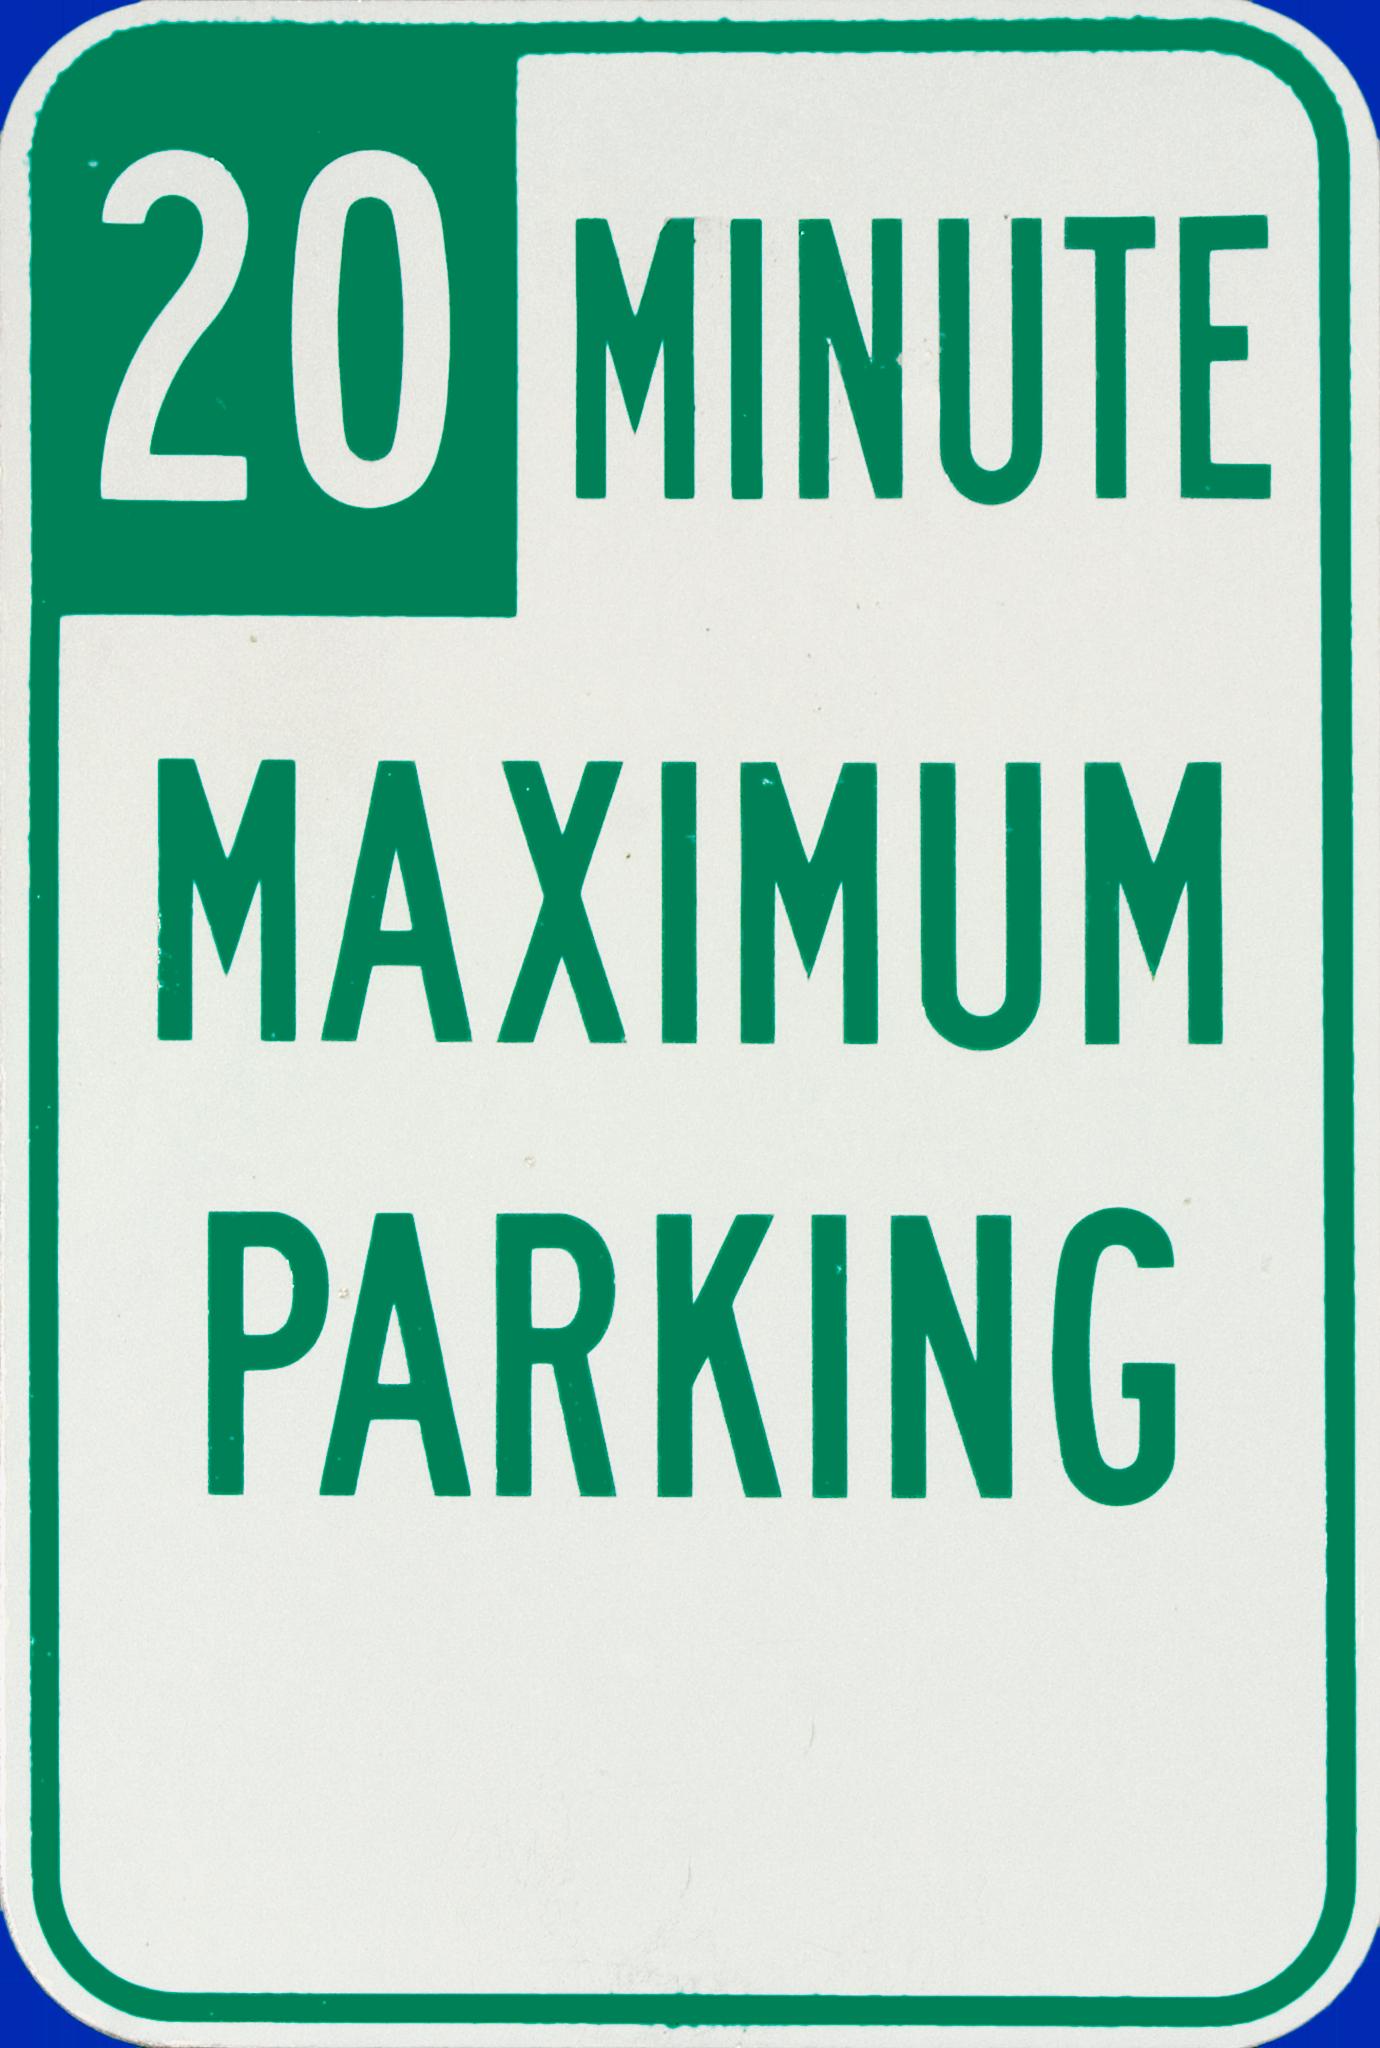 20 Min Parking.png